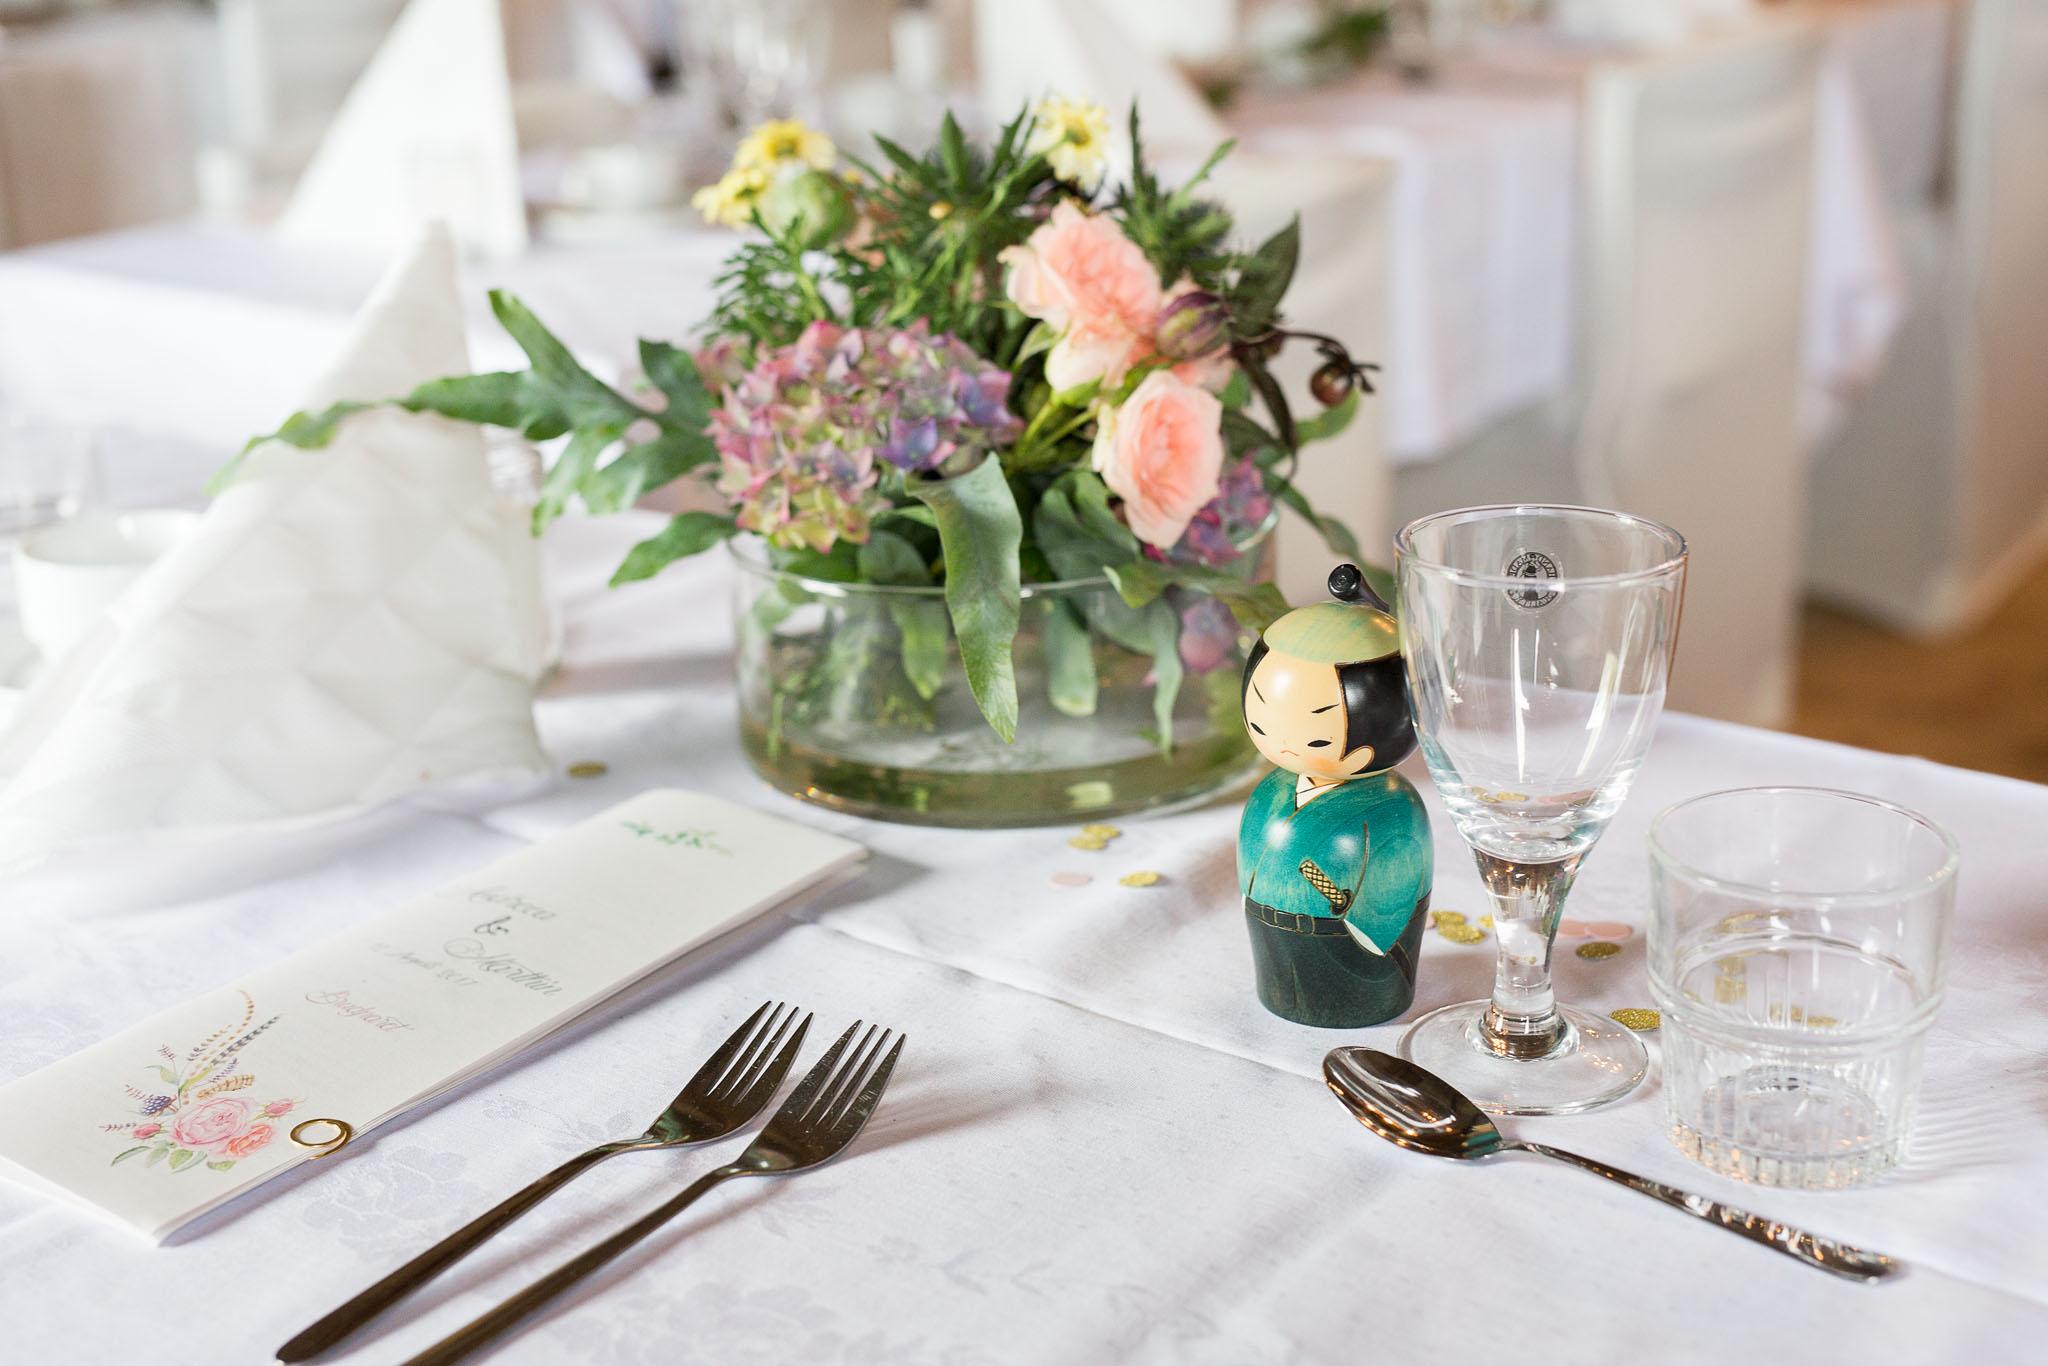 fotograf_sabina_wixner_hudiksvall_bröllop.jpg